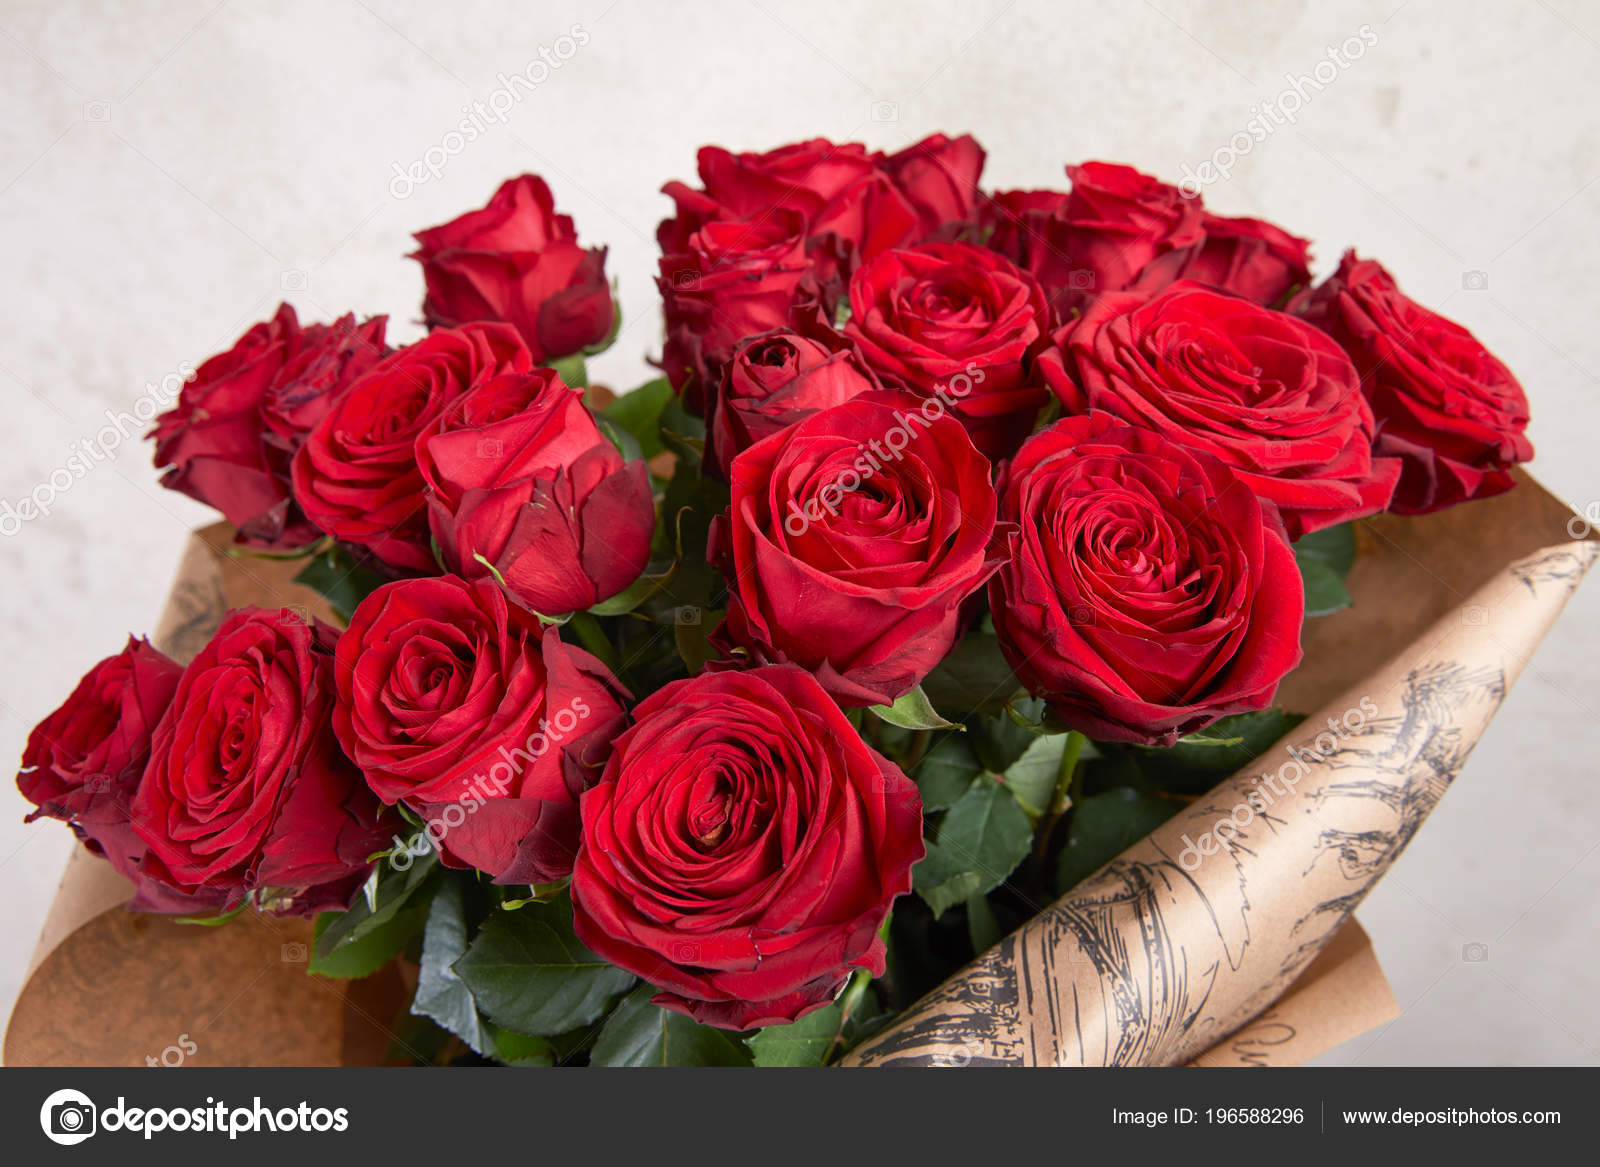 beau bouquet roses rouges photographie nikolodion. Black Bedroom Furniture Sets. Home Design Ideas